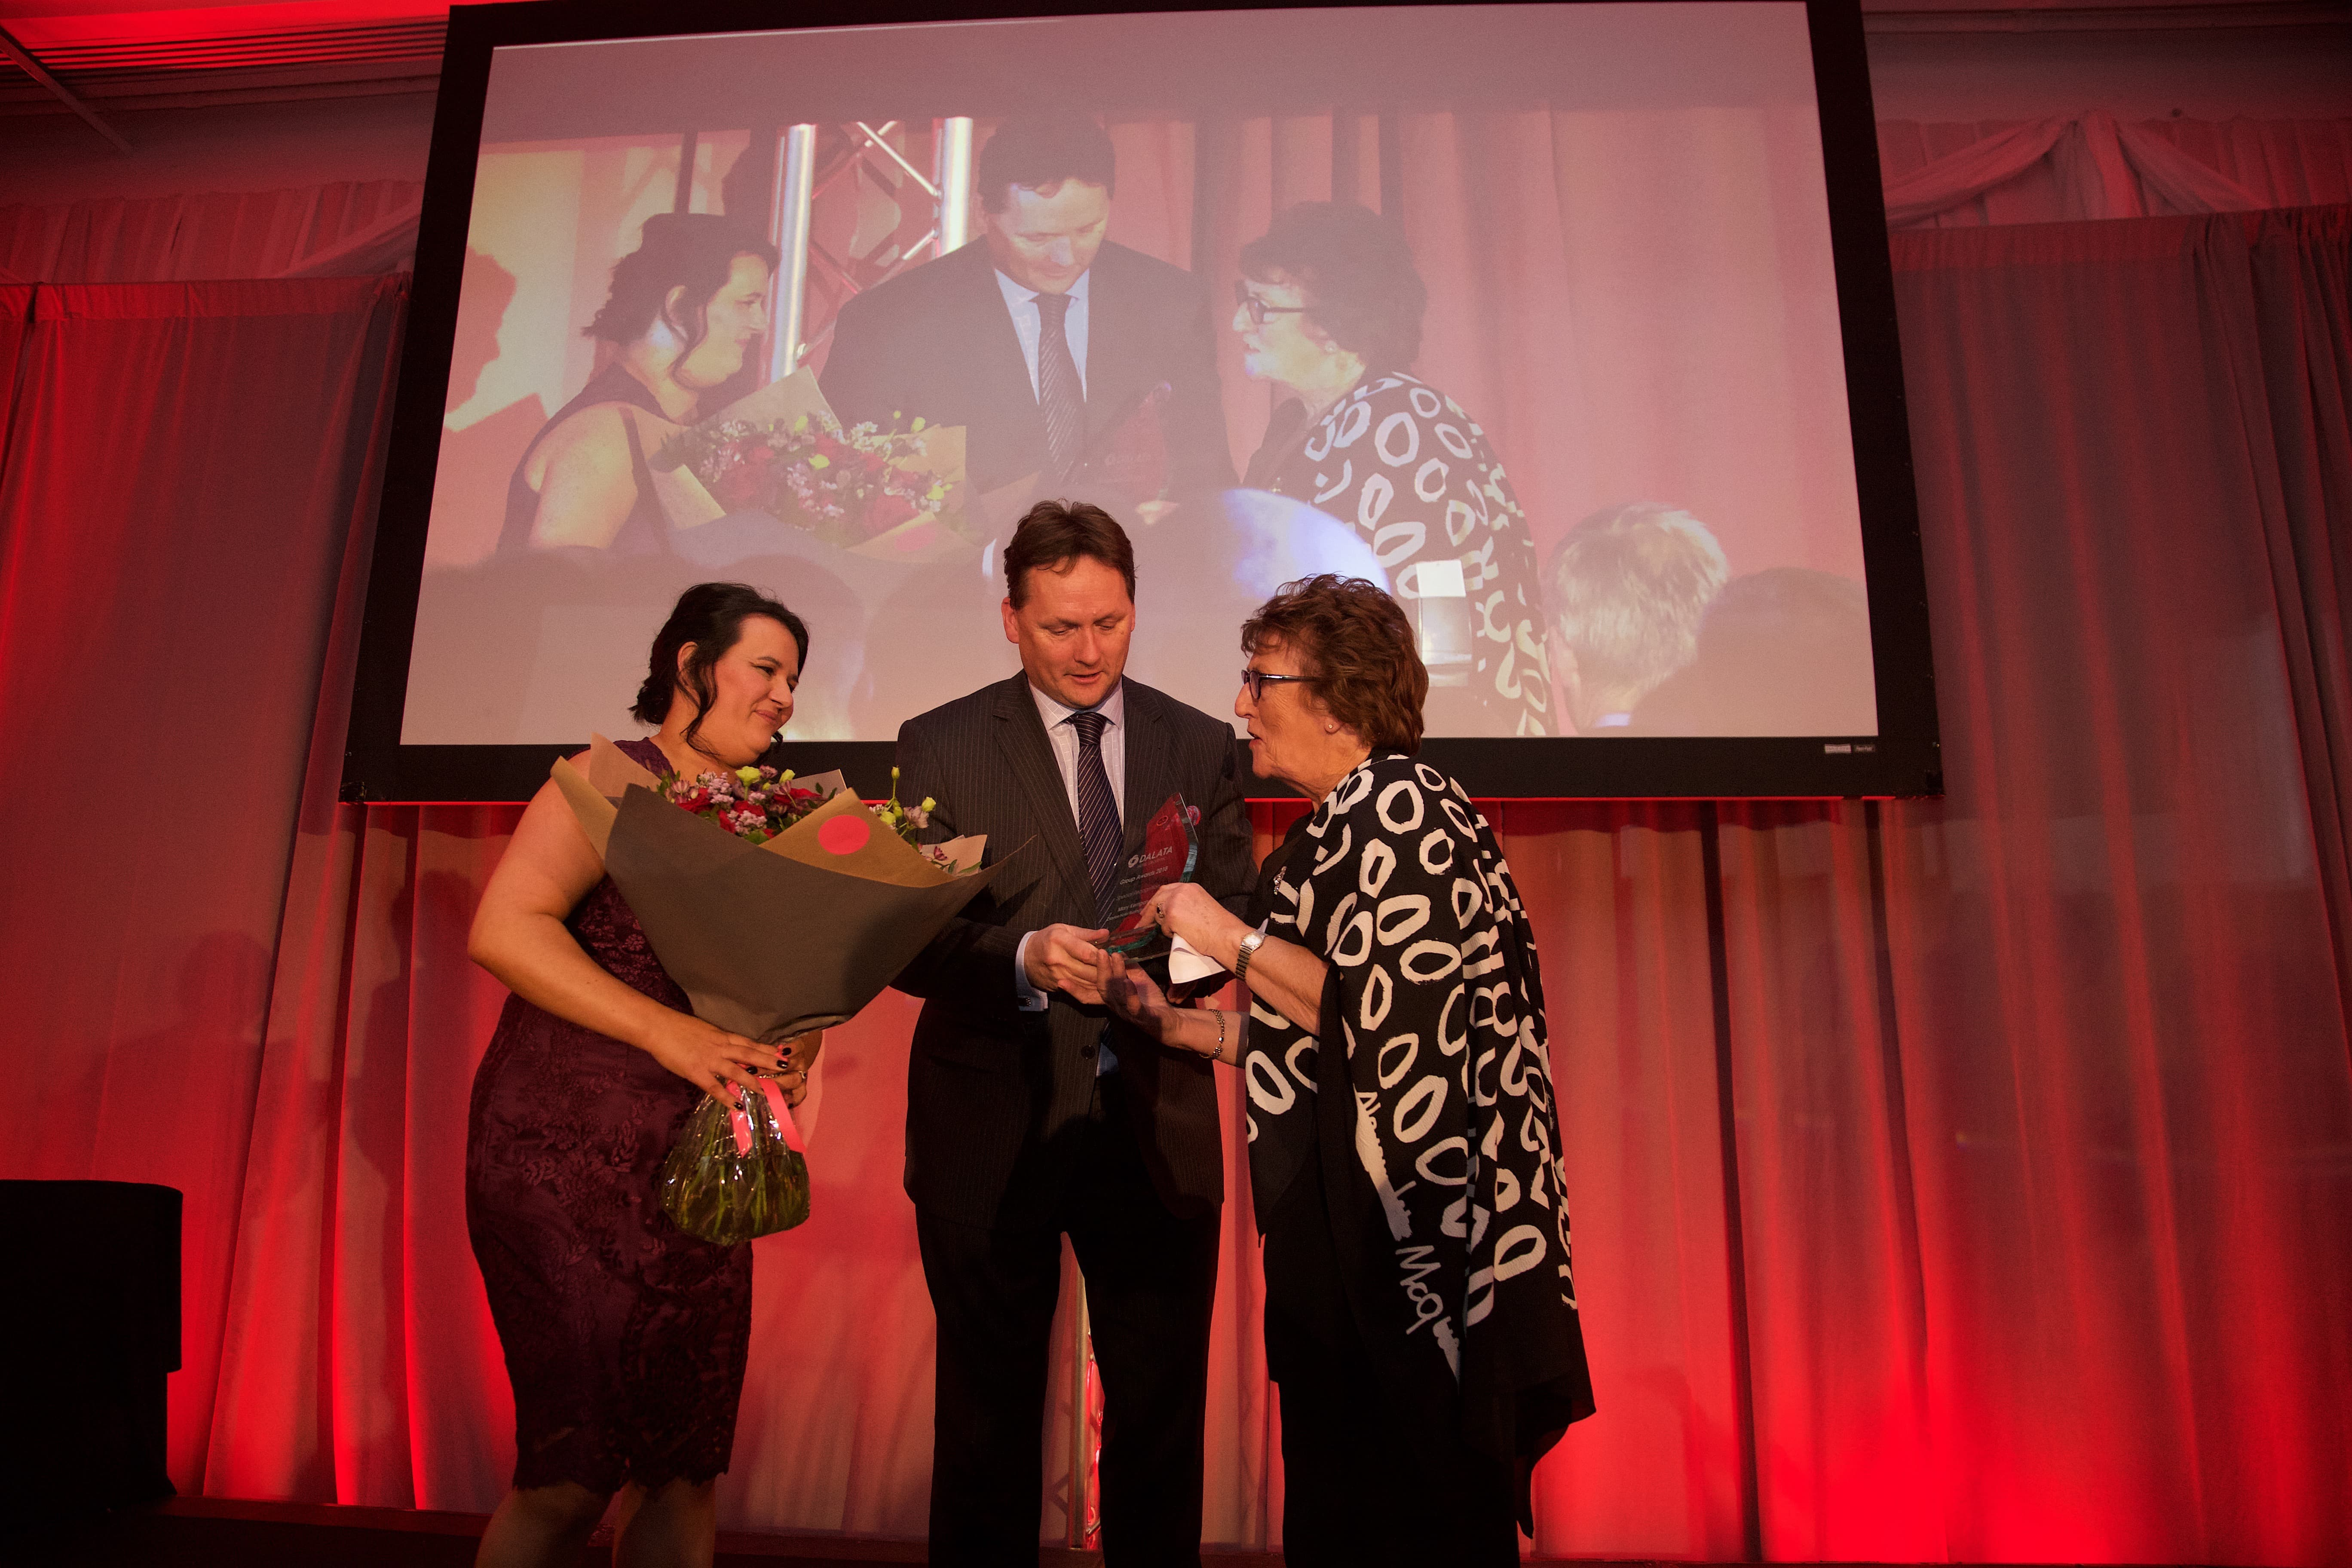 Award winners photograph